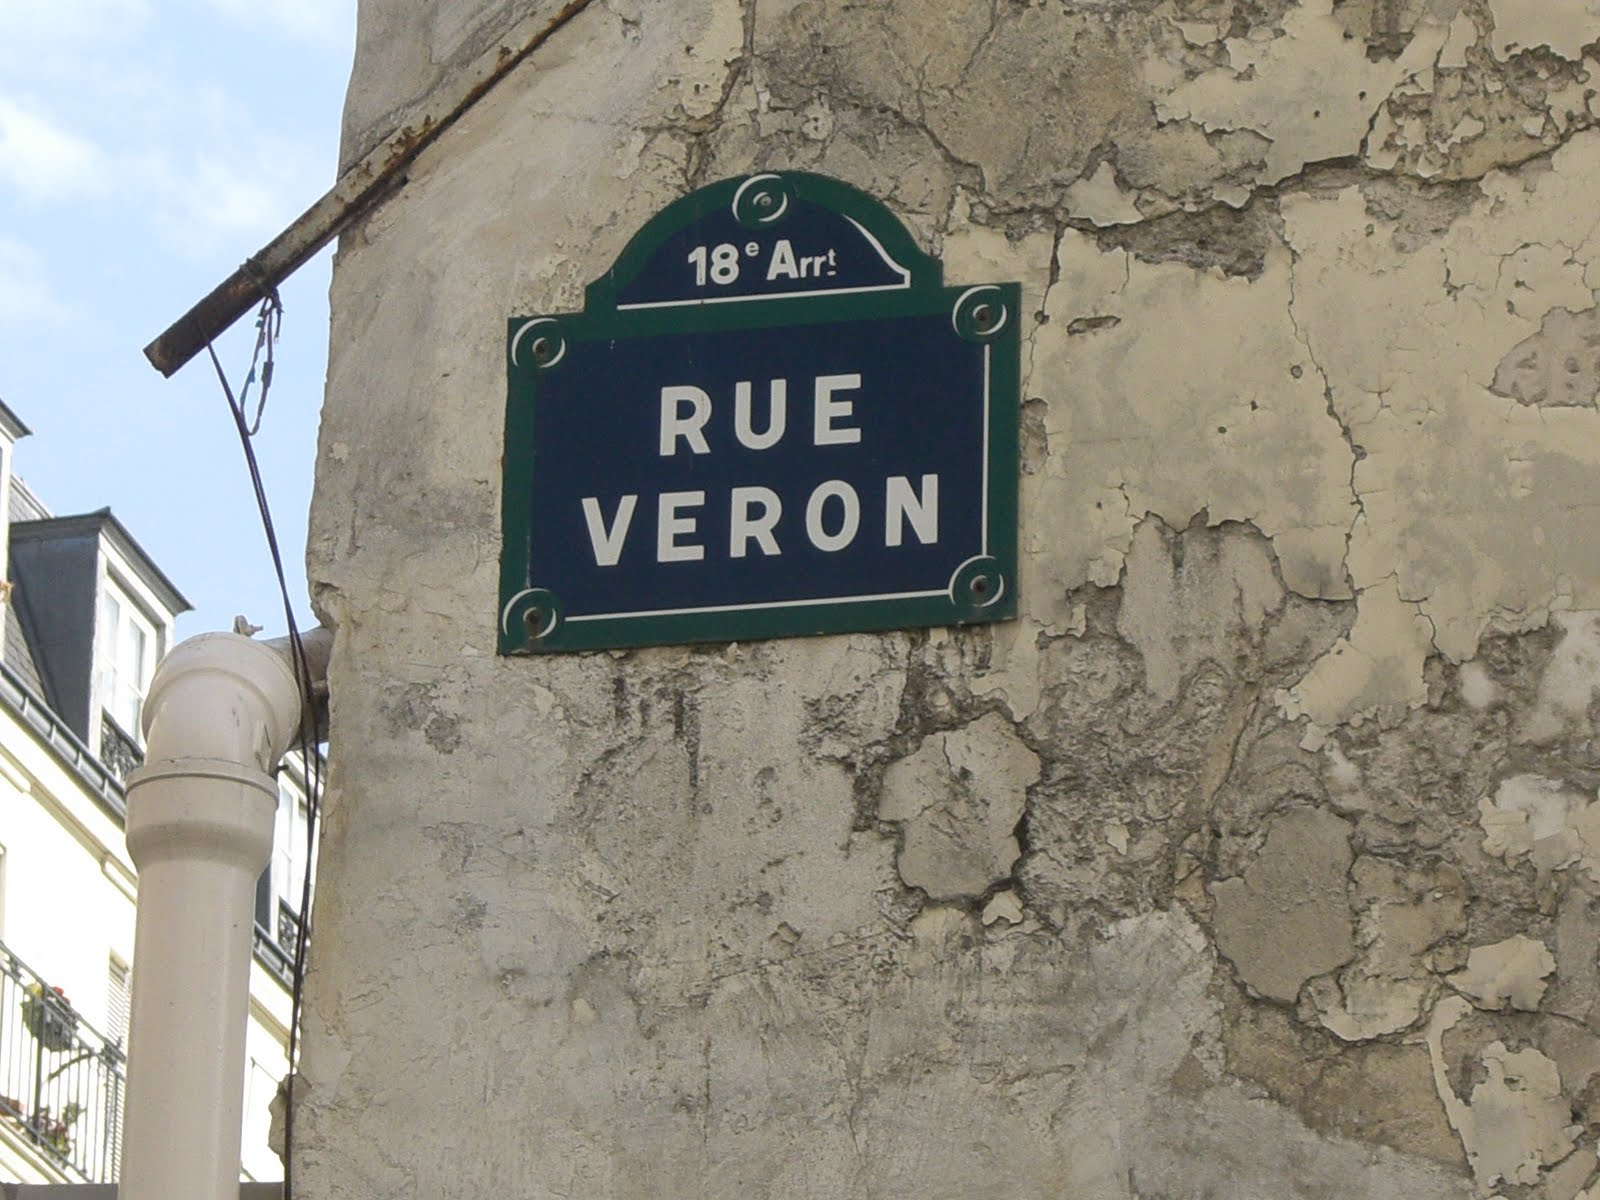 Rue v ron dao nyxa for Garage alfortville rue veron